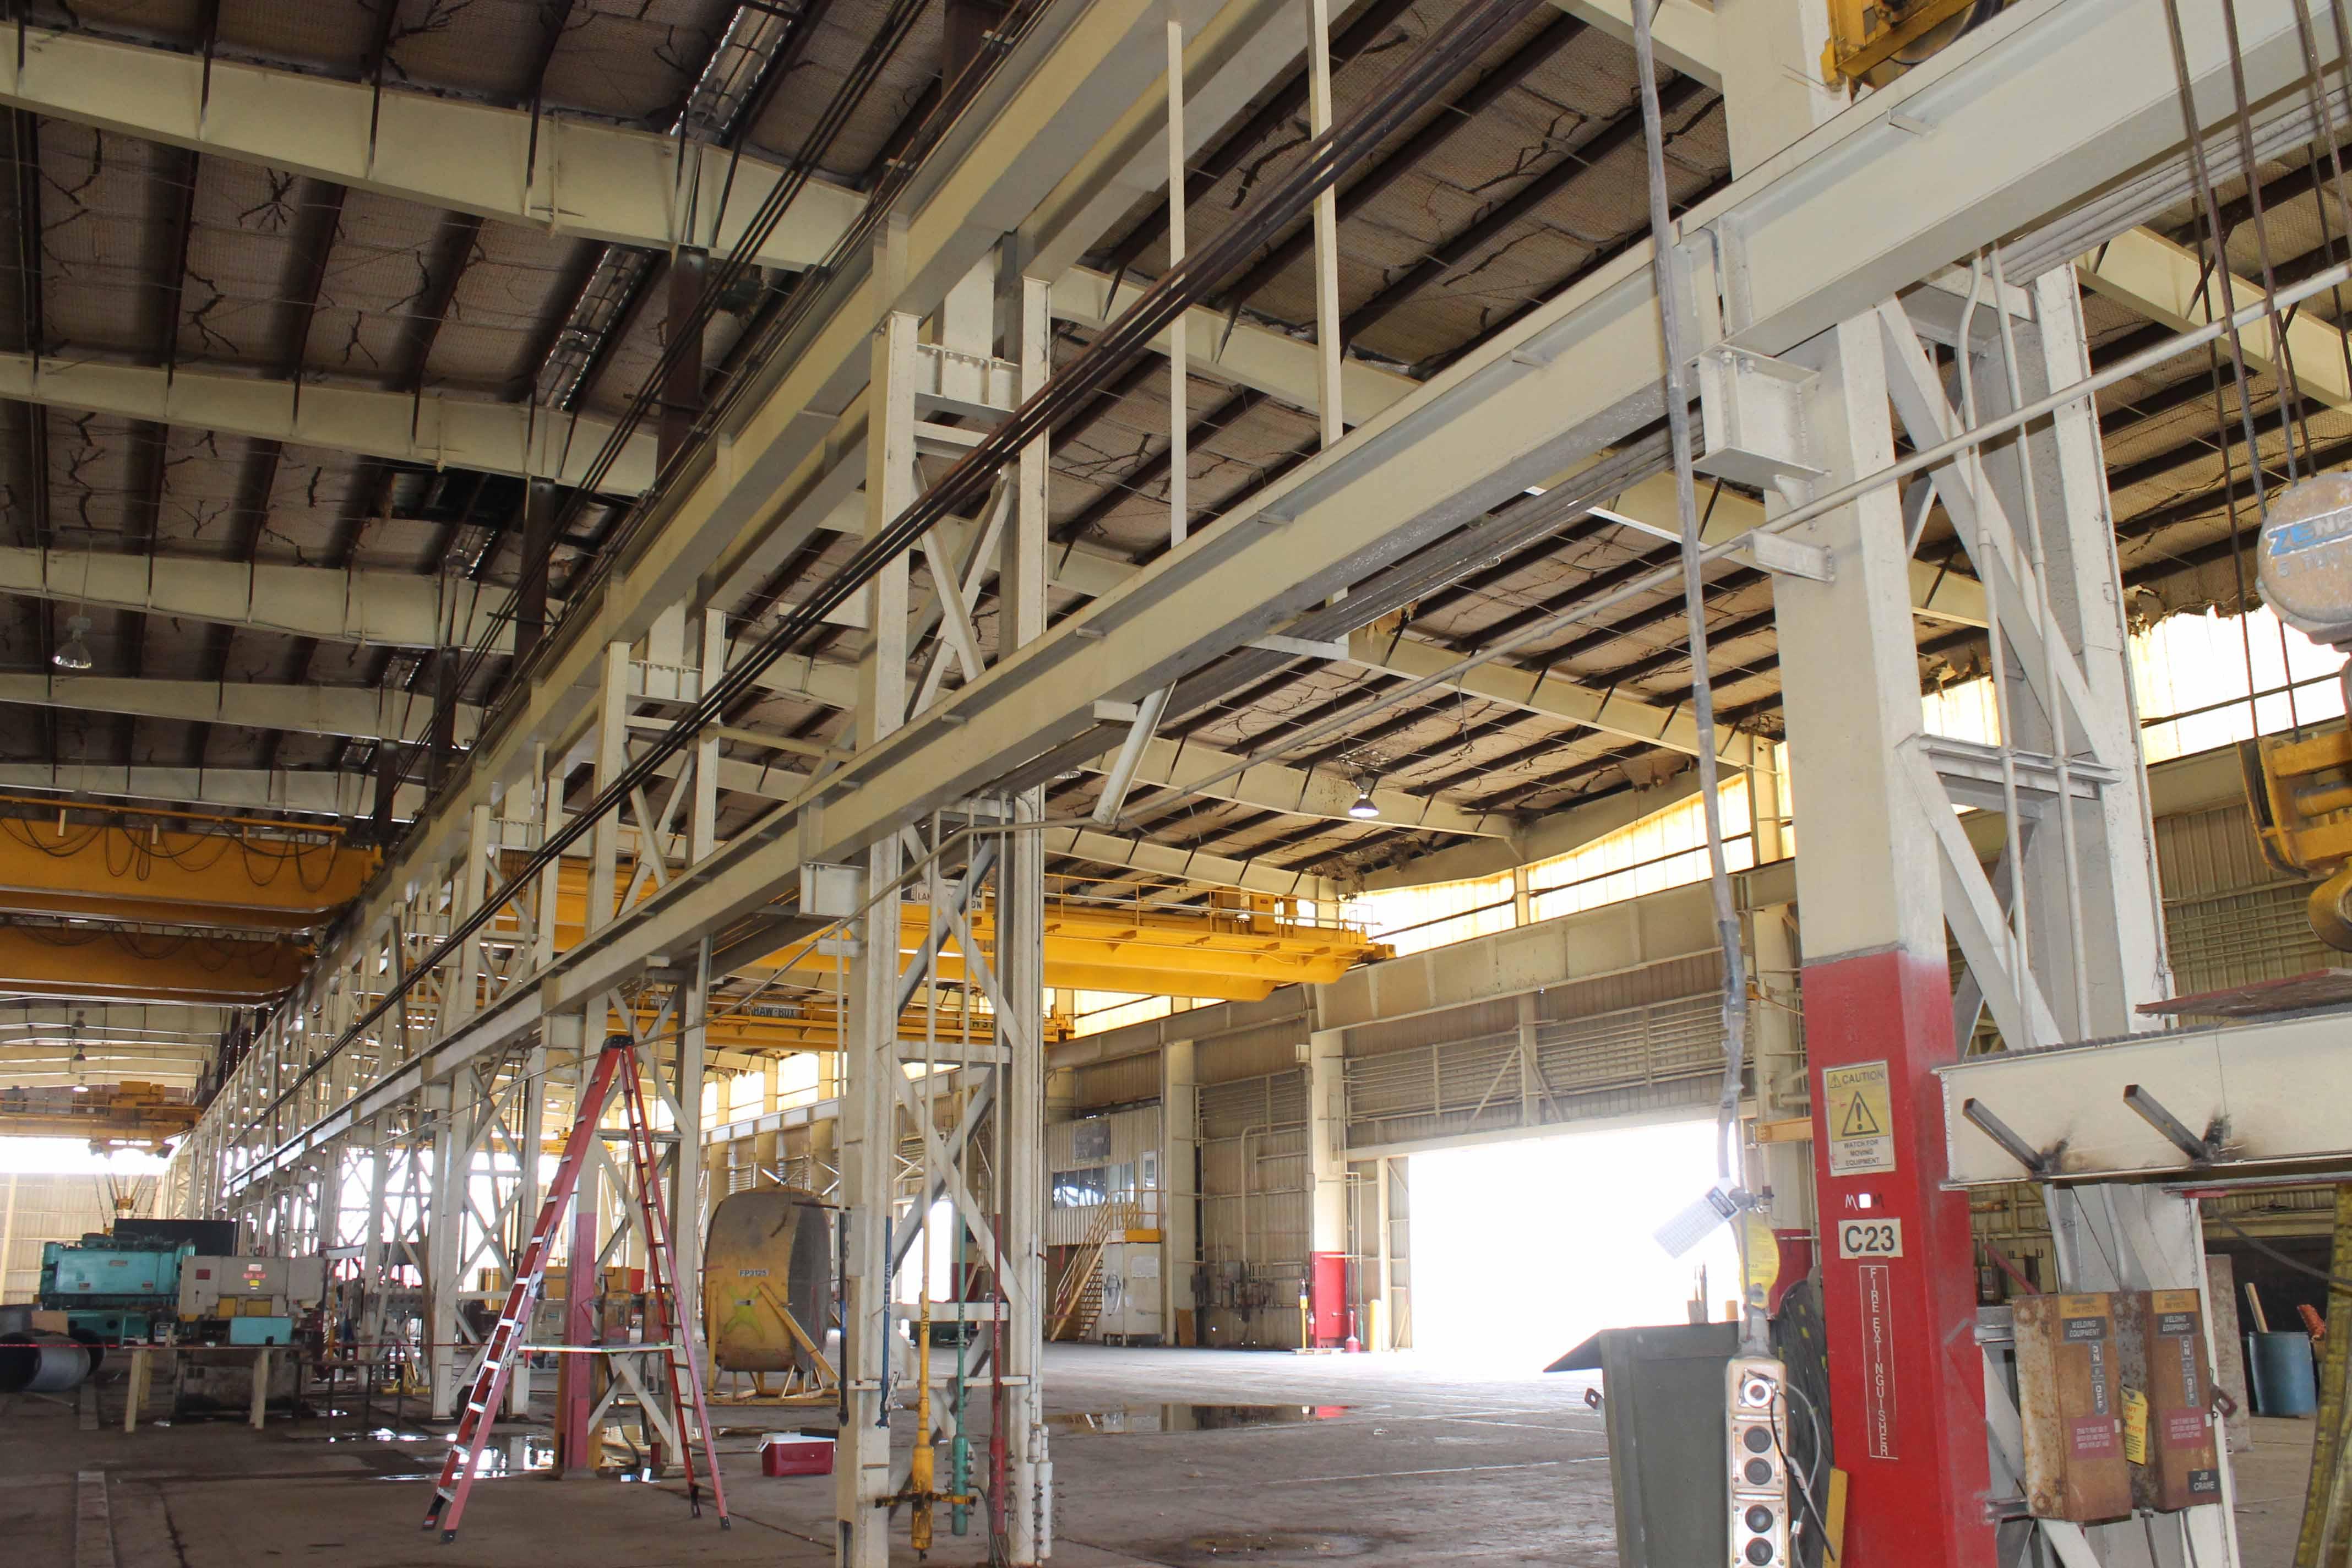 Lot 12 - Dual I-beam OH Crane Runway, approx 325', w/rail (Location: Pipe Shop)